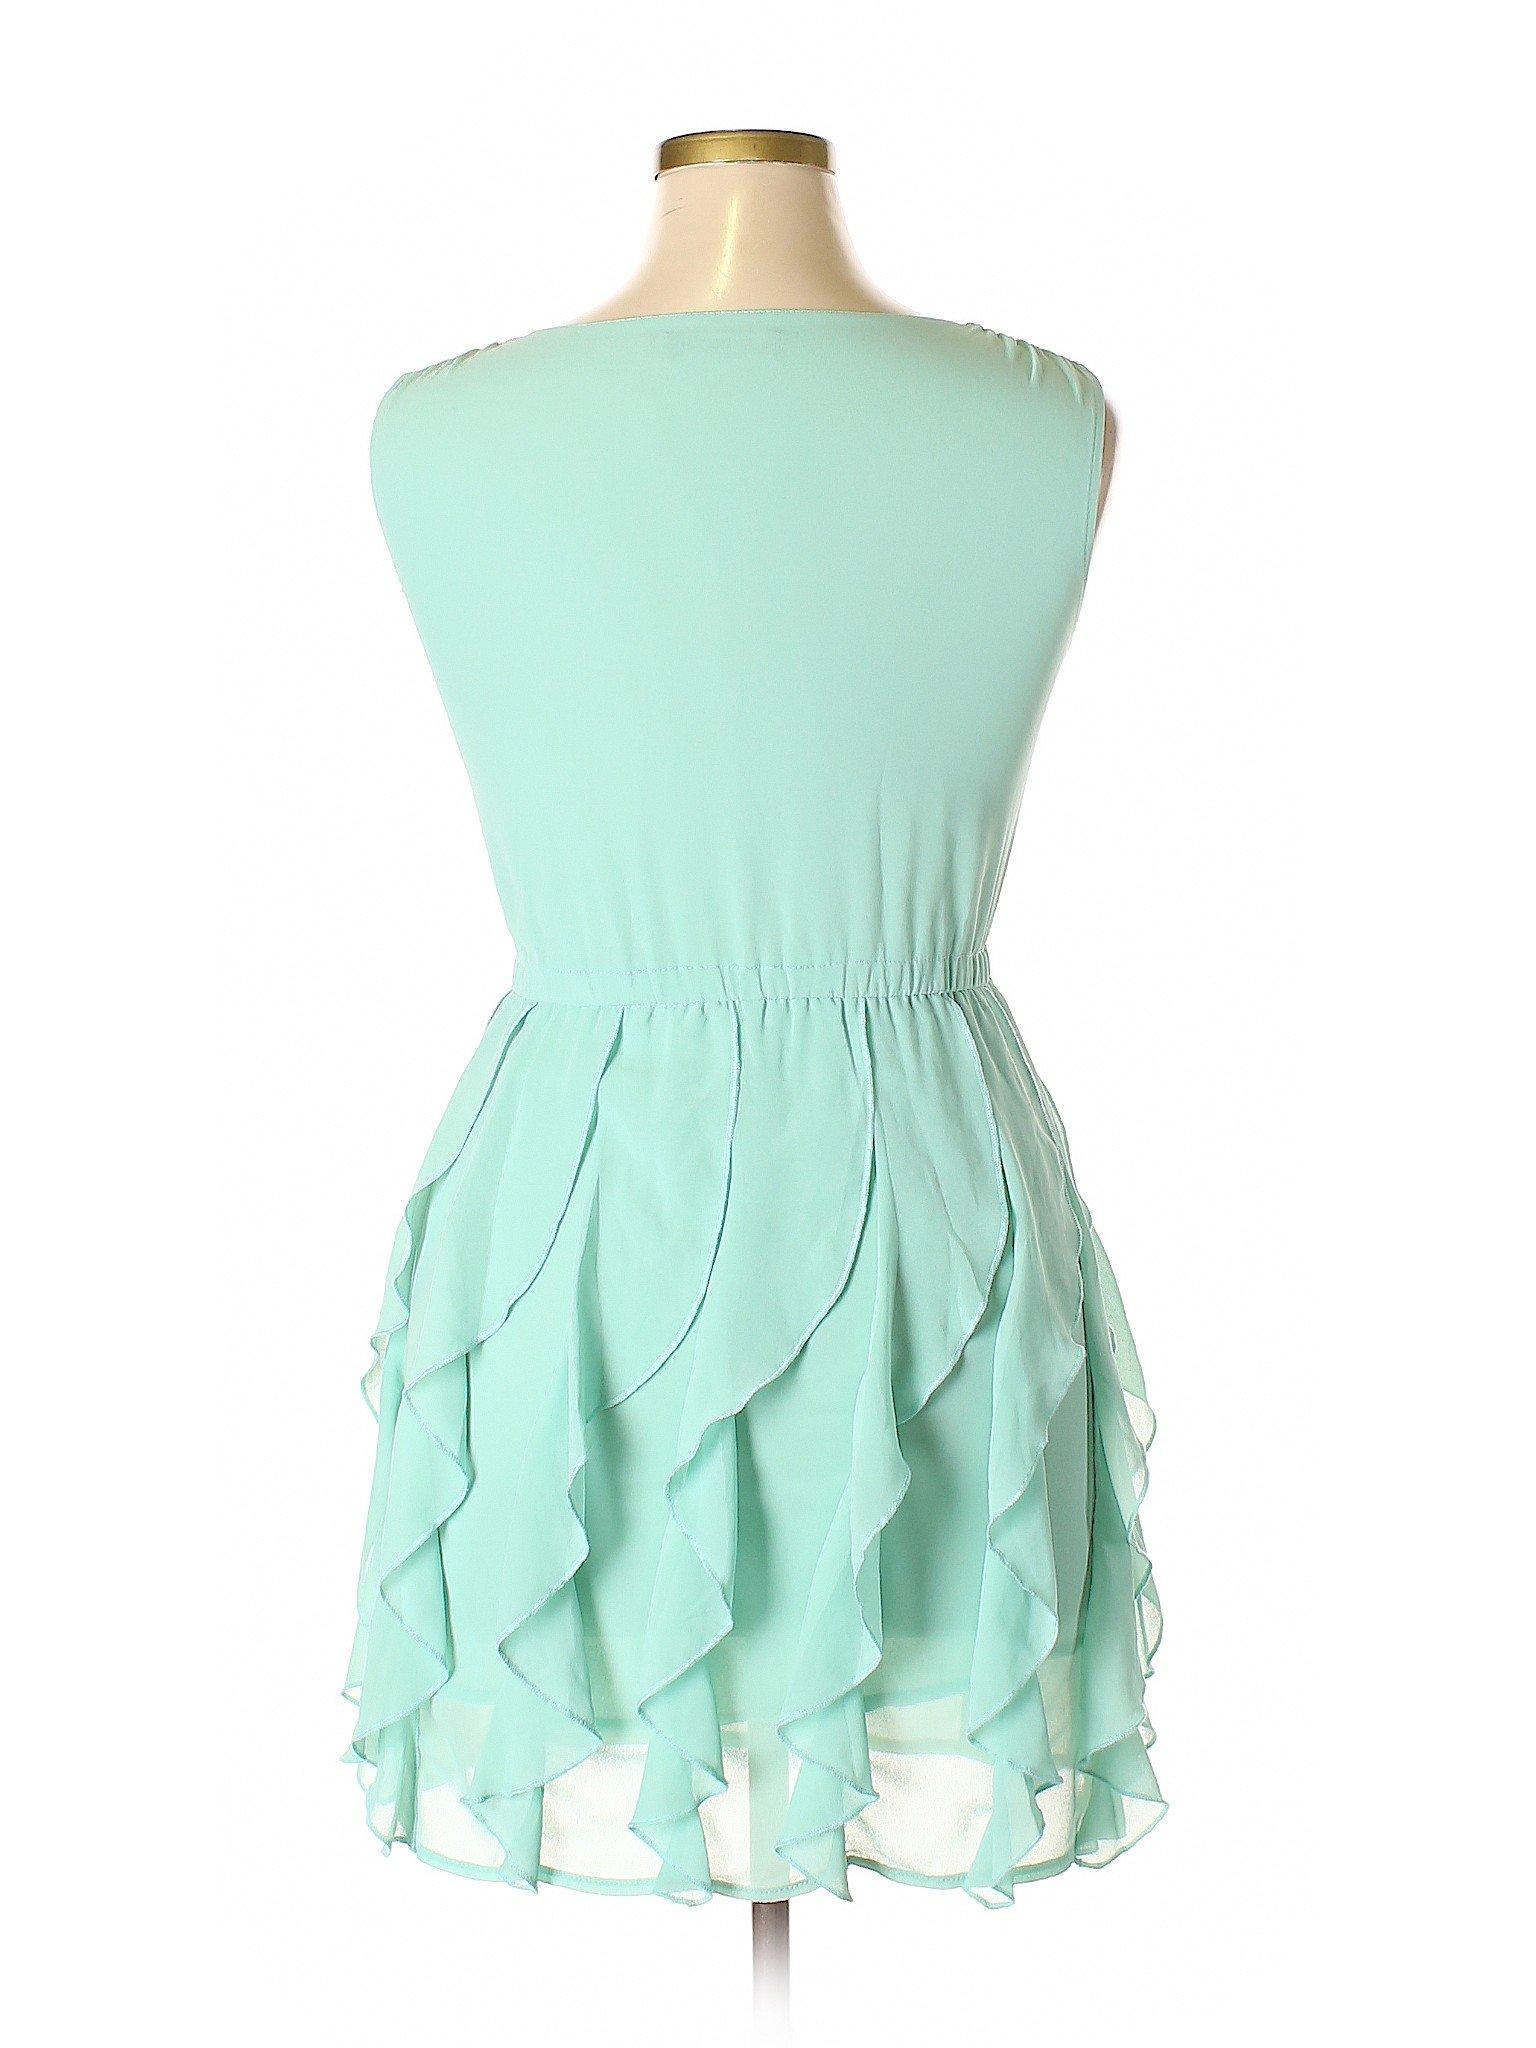 Selling Casual Selling Casual Oasap Oasap Selling Dress Dress Oasap Casual Dress Selling TqT4wF17